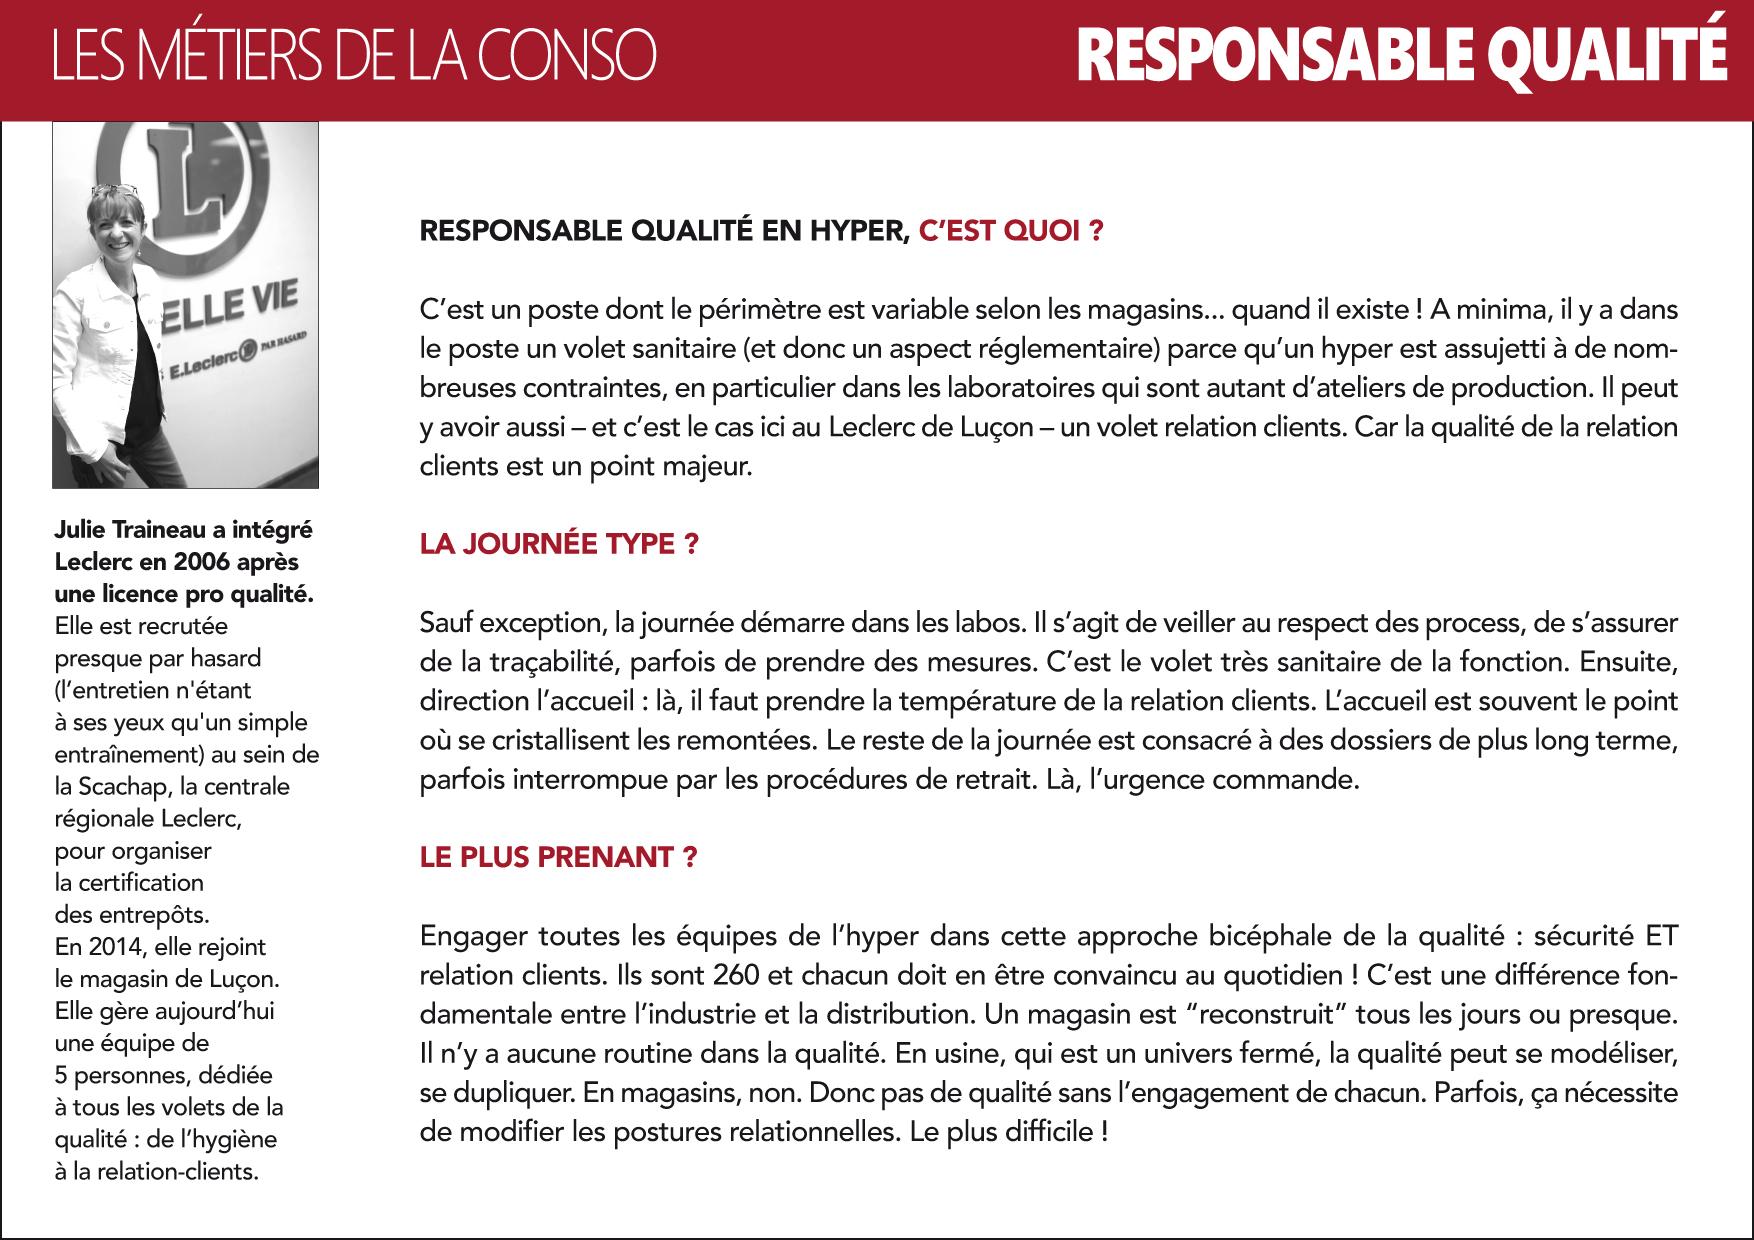 RespQual-3